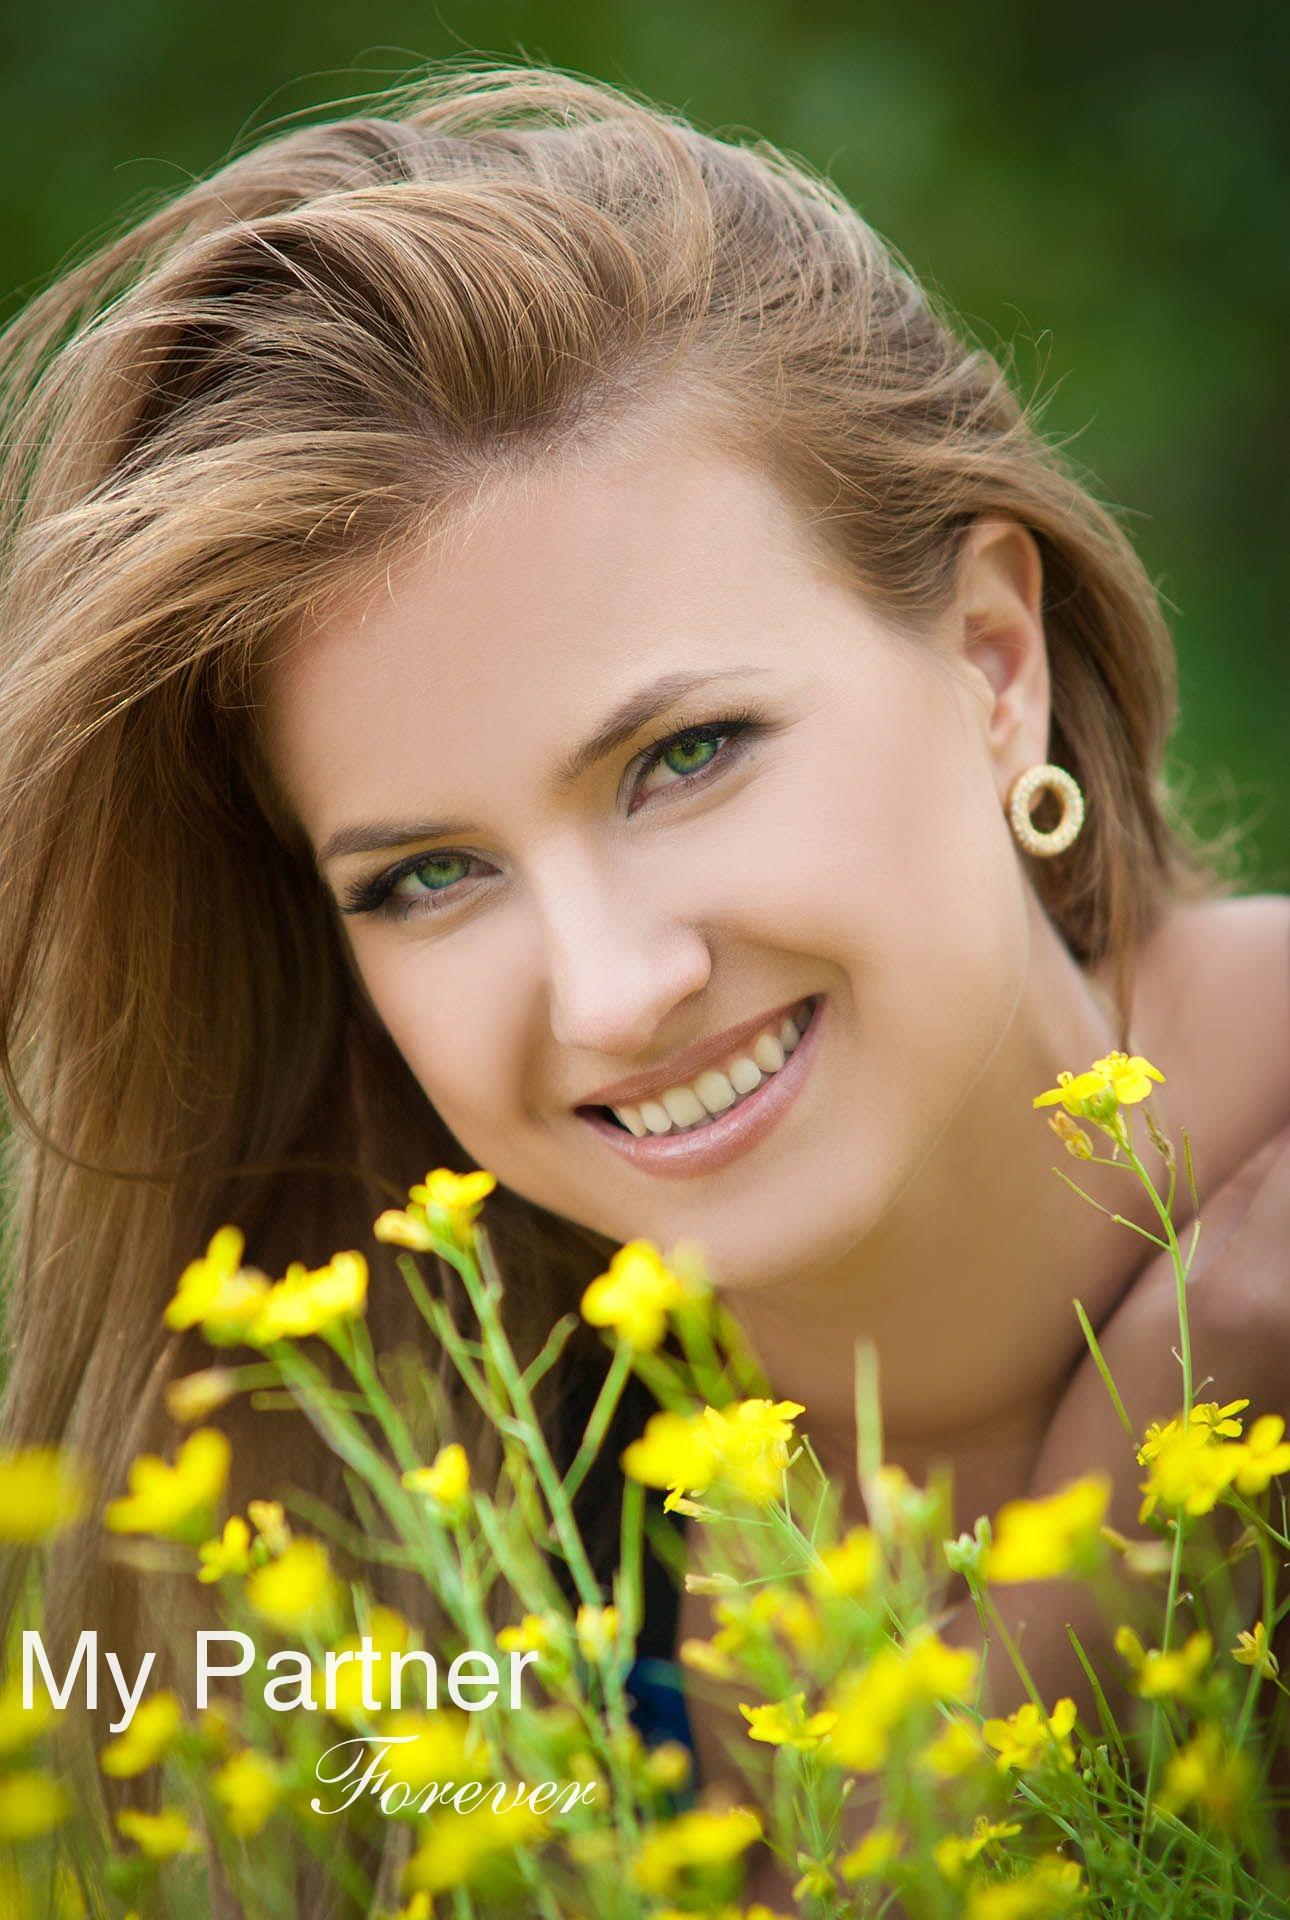 Dating Site to Meet Charming Ukrainian Woman Elena from Zaporozhye, Ukraine